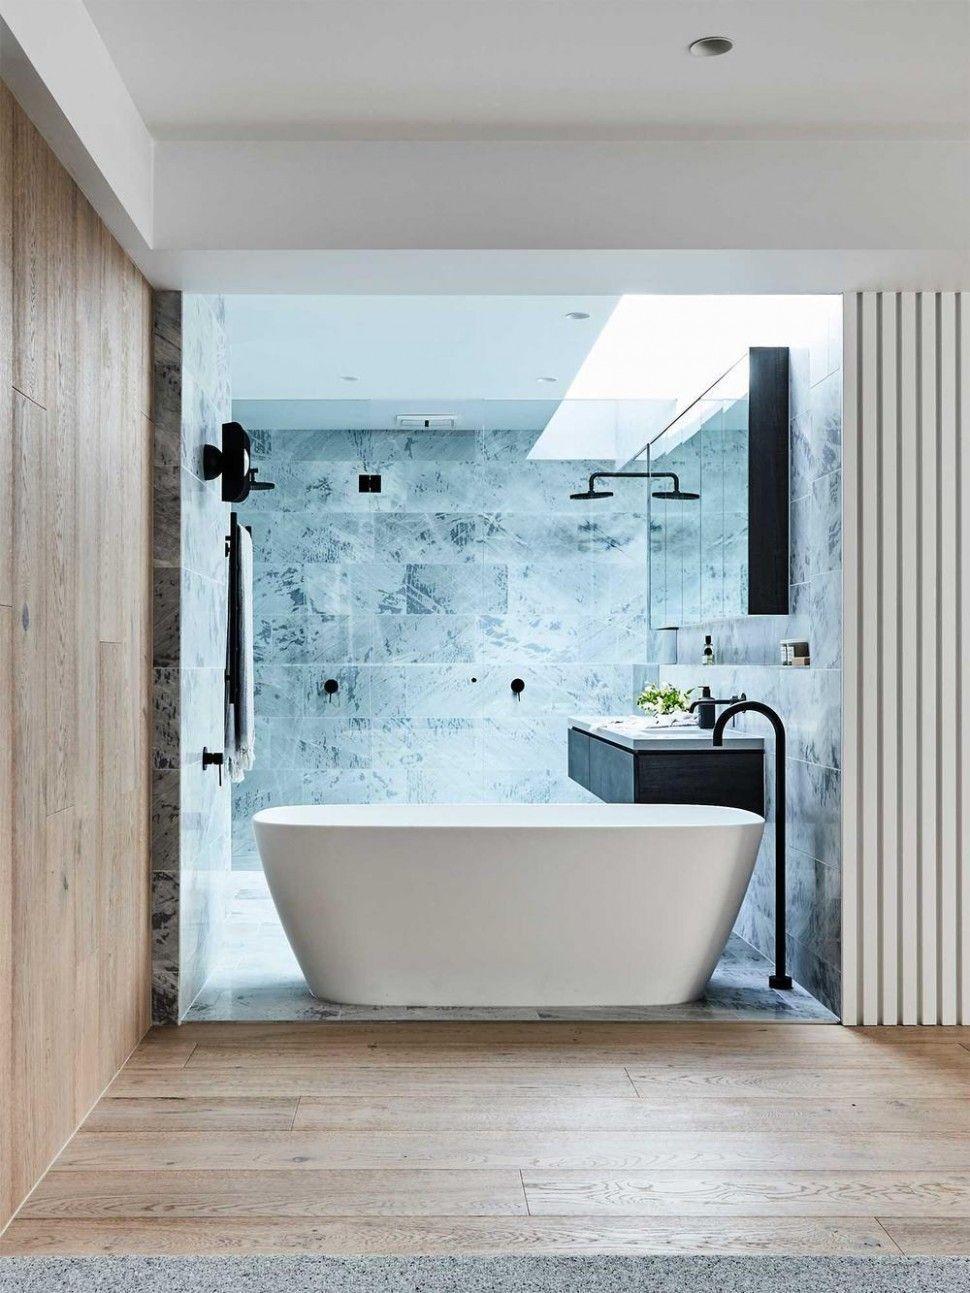 Australia Bathroom Ideas Tiles Bathroom Tiles Ideas Australia Bathroom Tiles Austra Open Plan Bathrooms Bathroom Design Trends Open Plan Bathroom Design